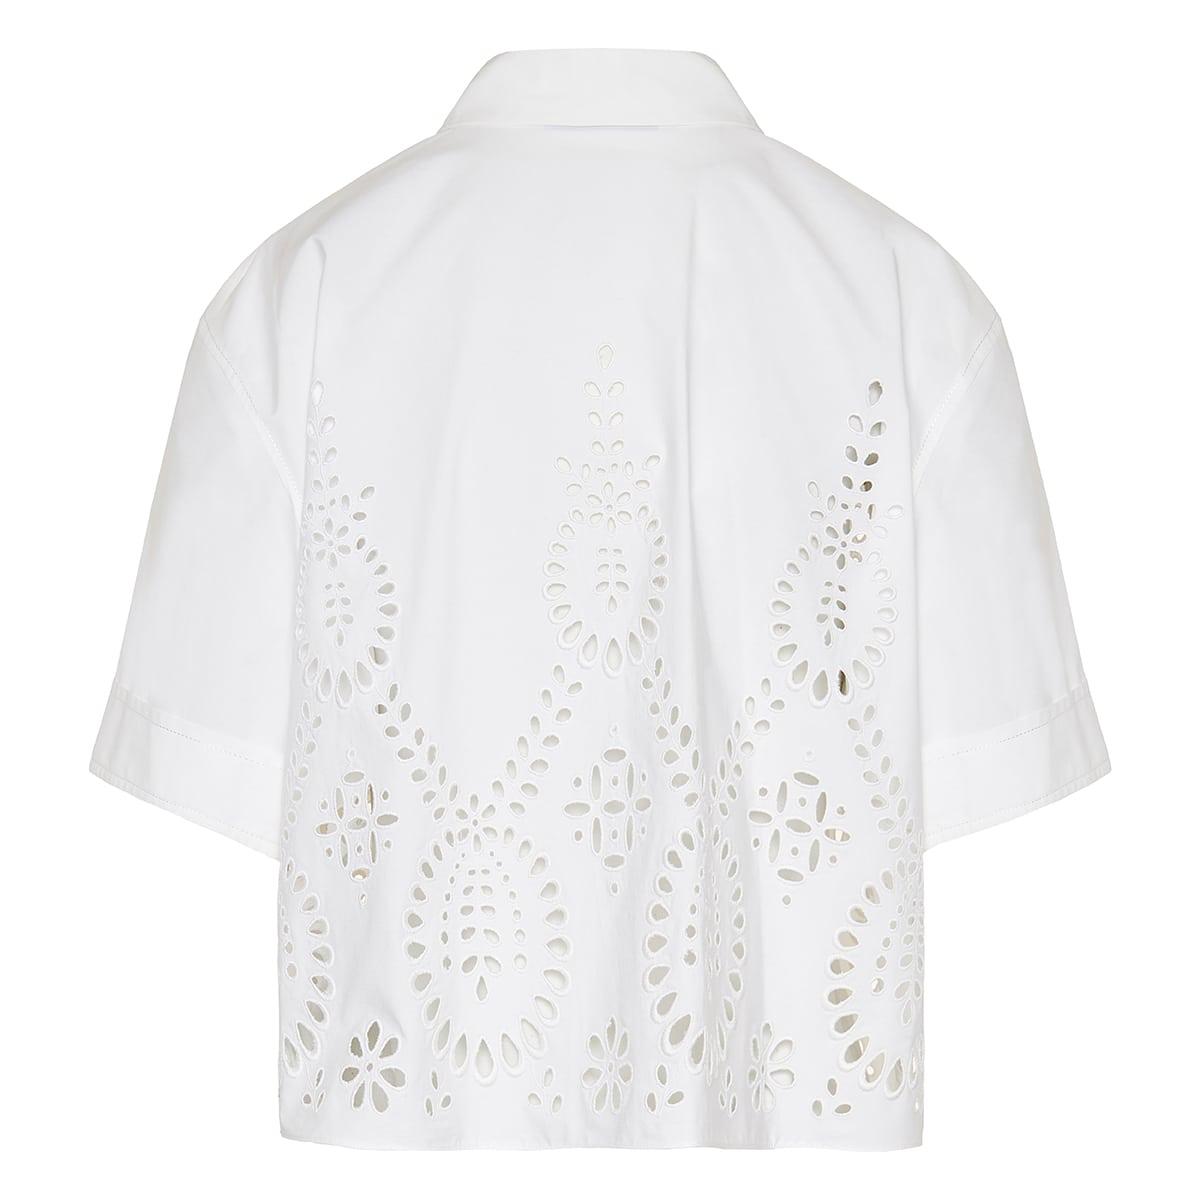 San Gallo cotton shirt